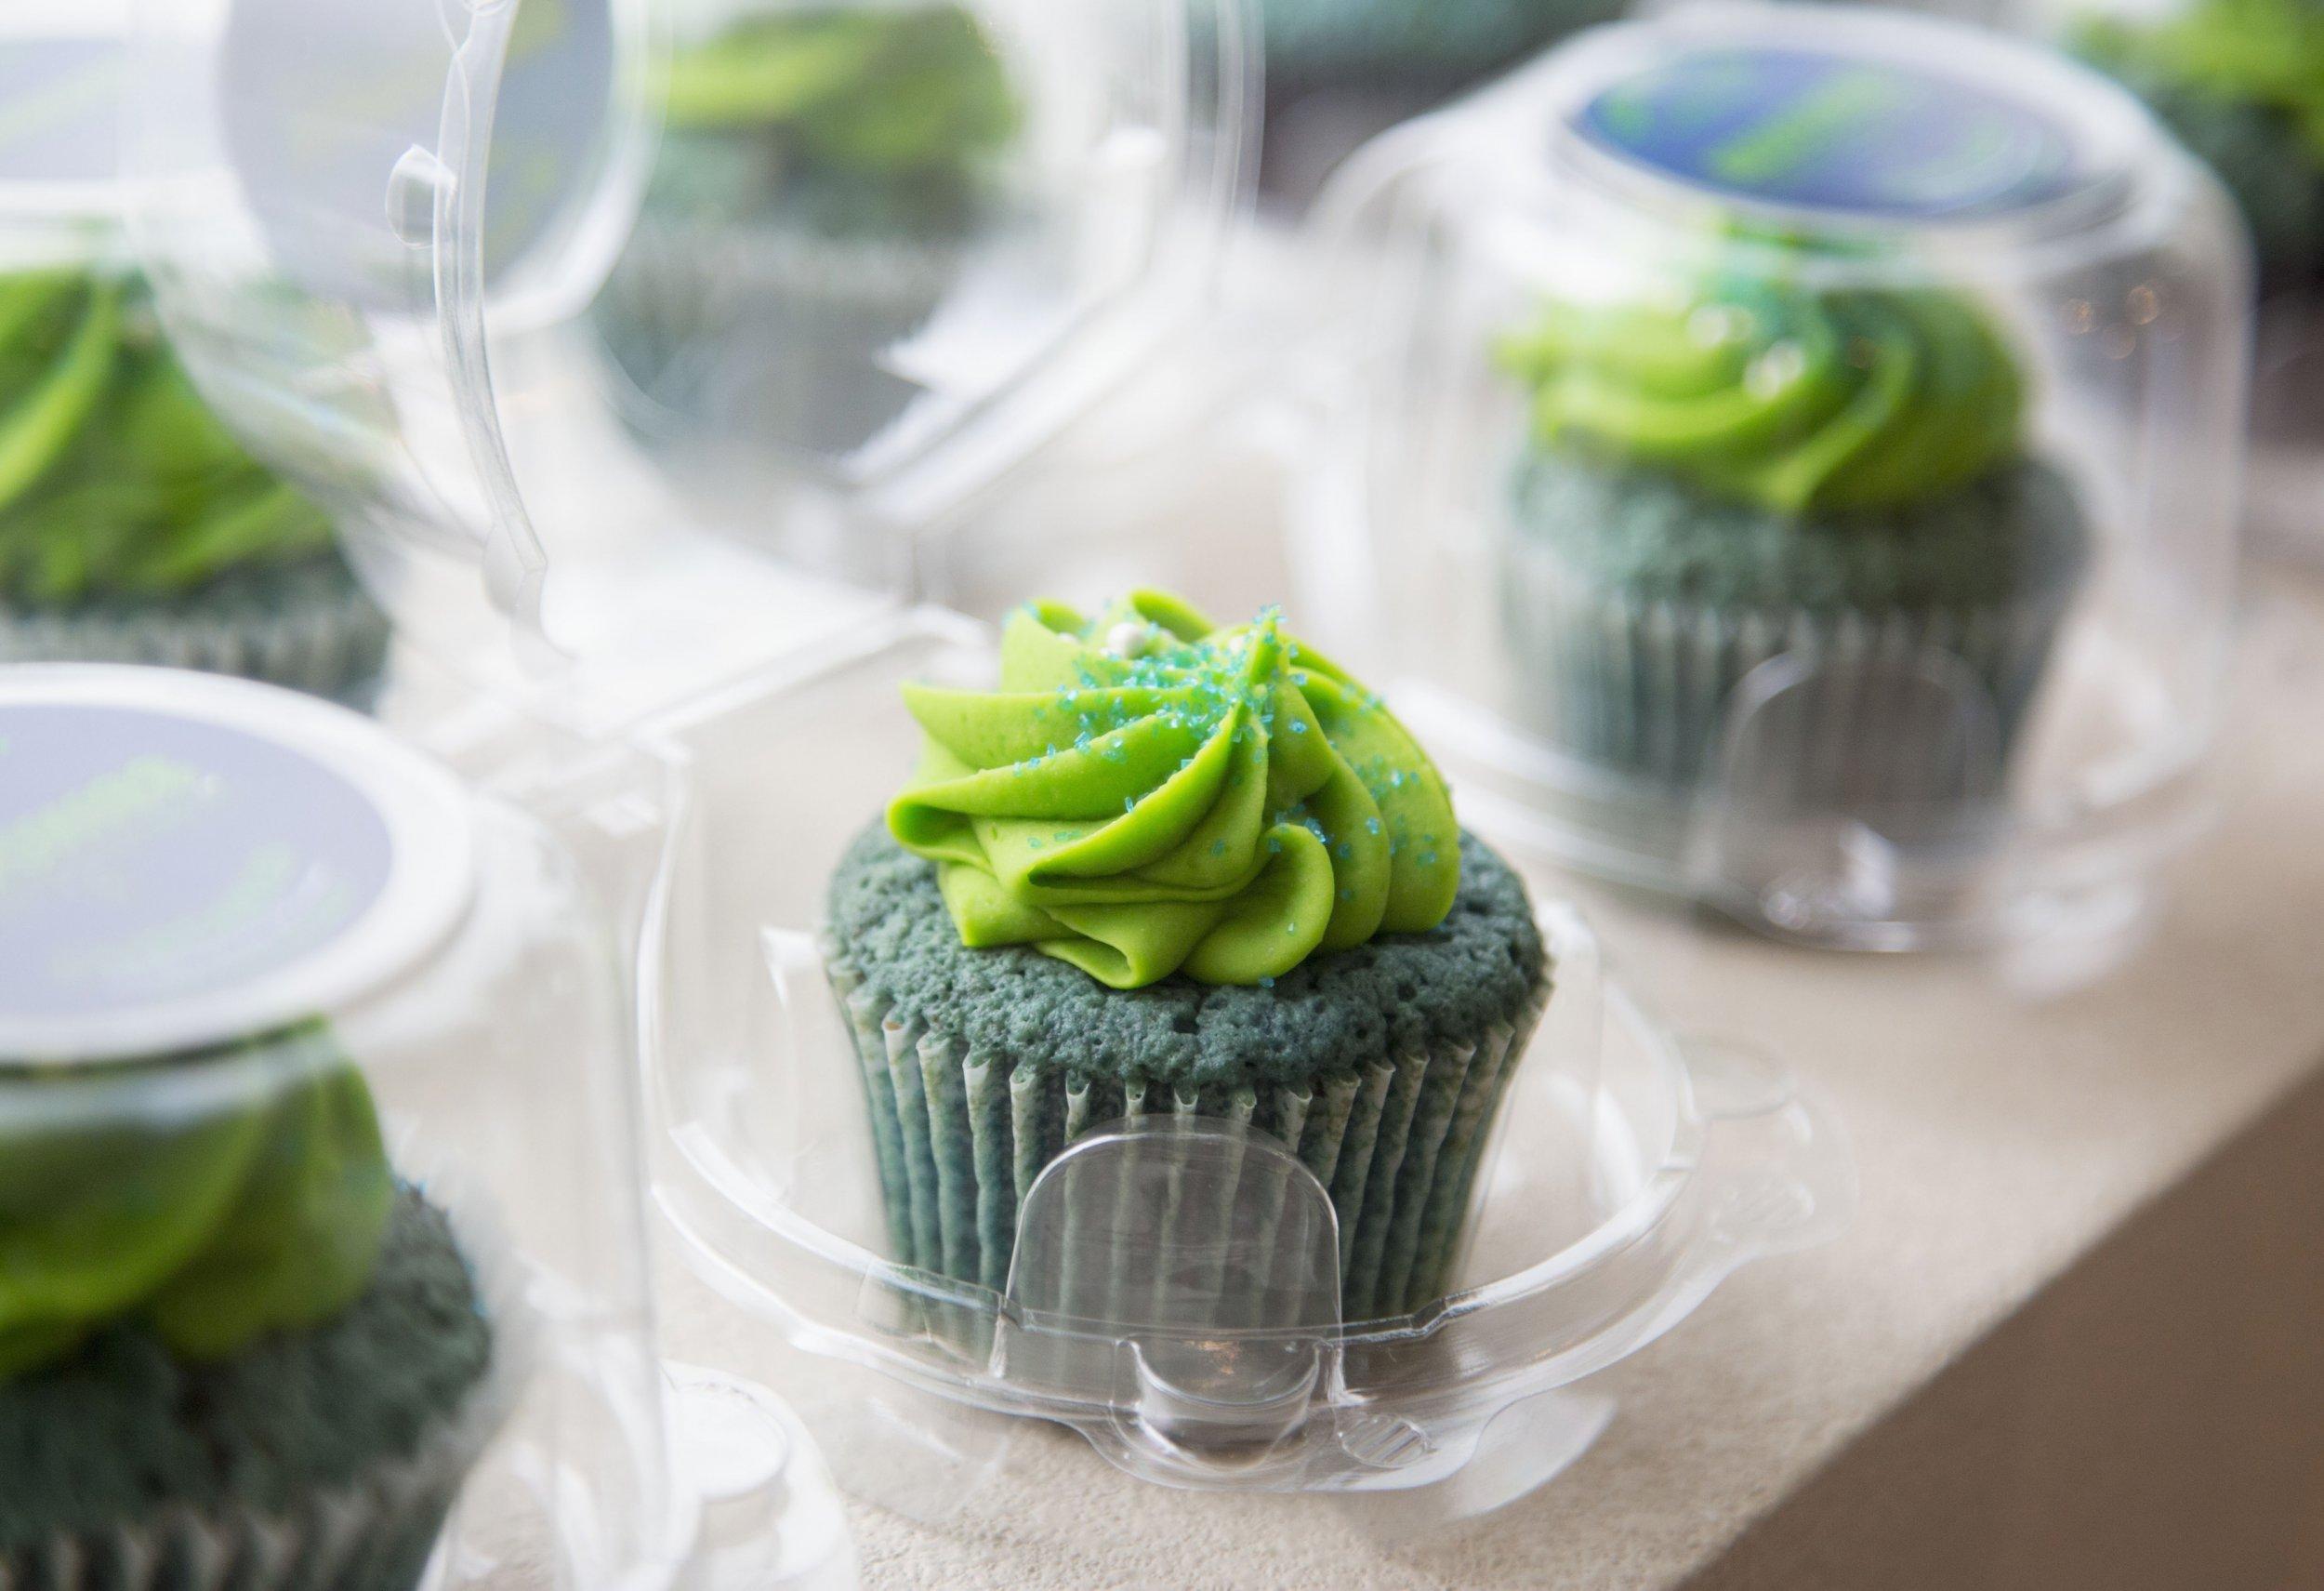 Marijuana cupcakes